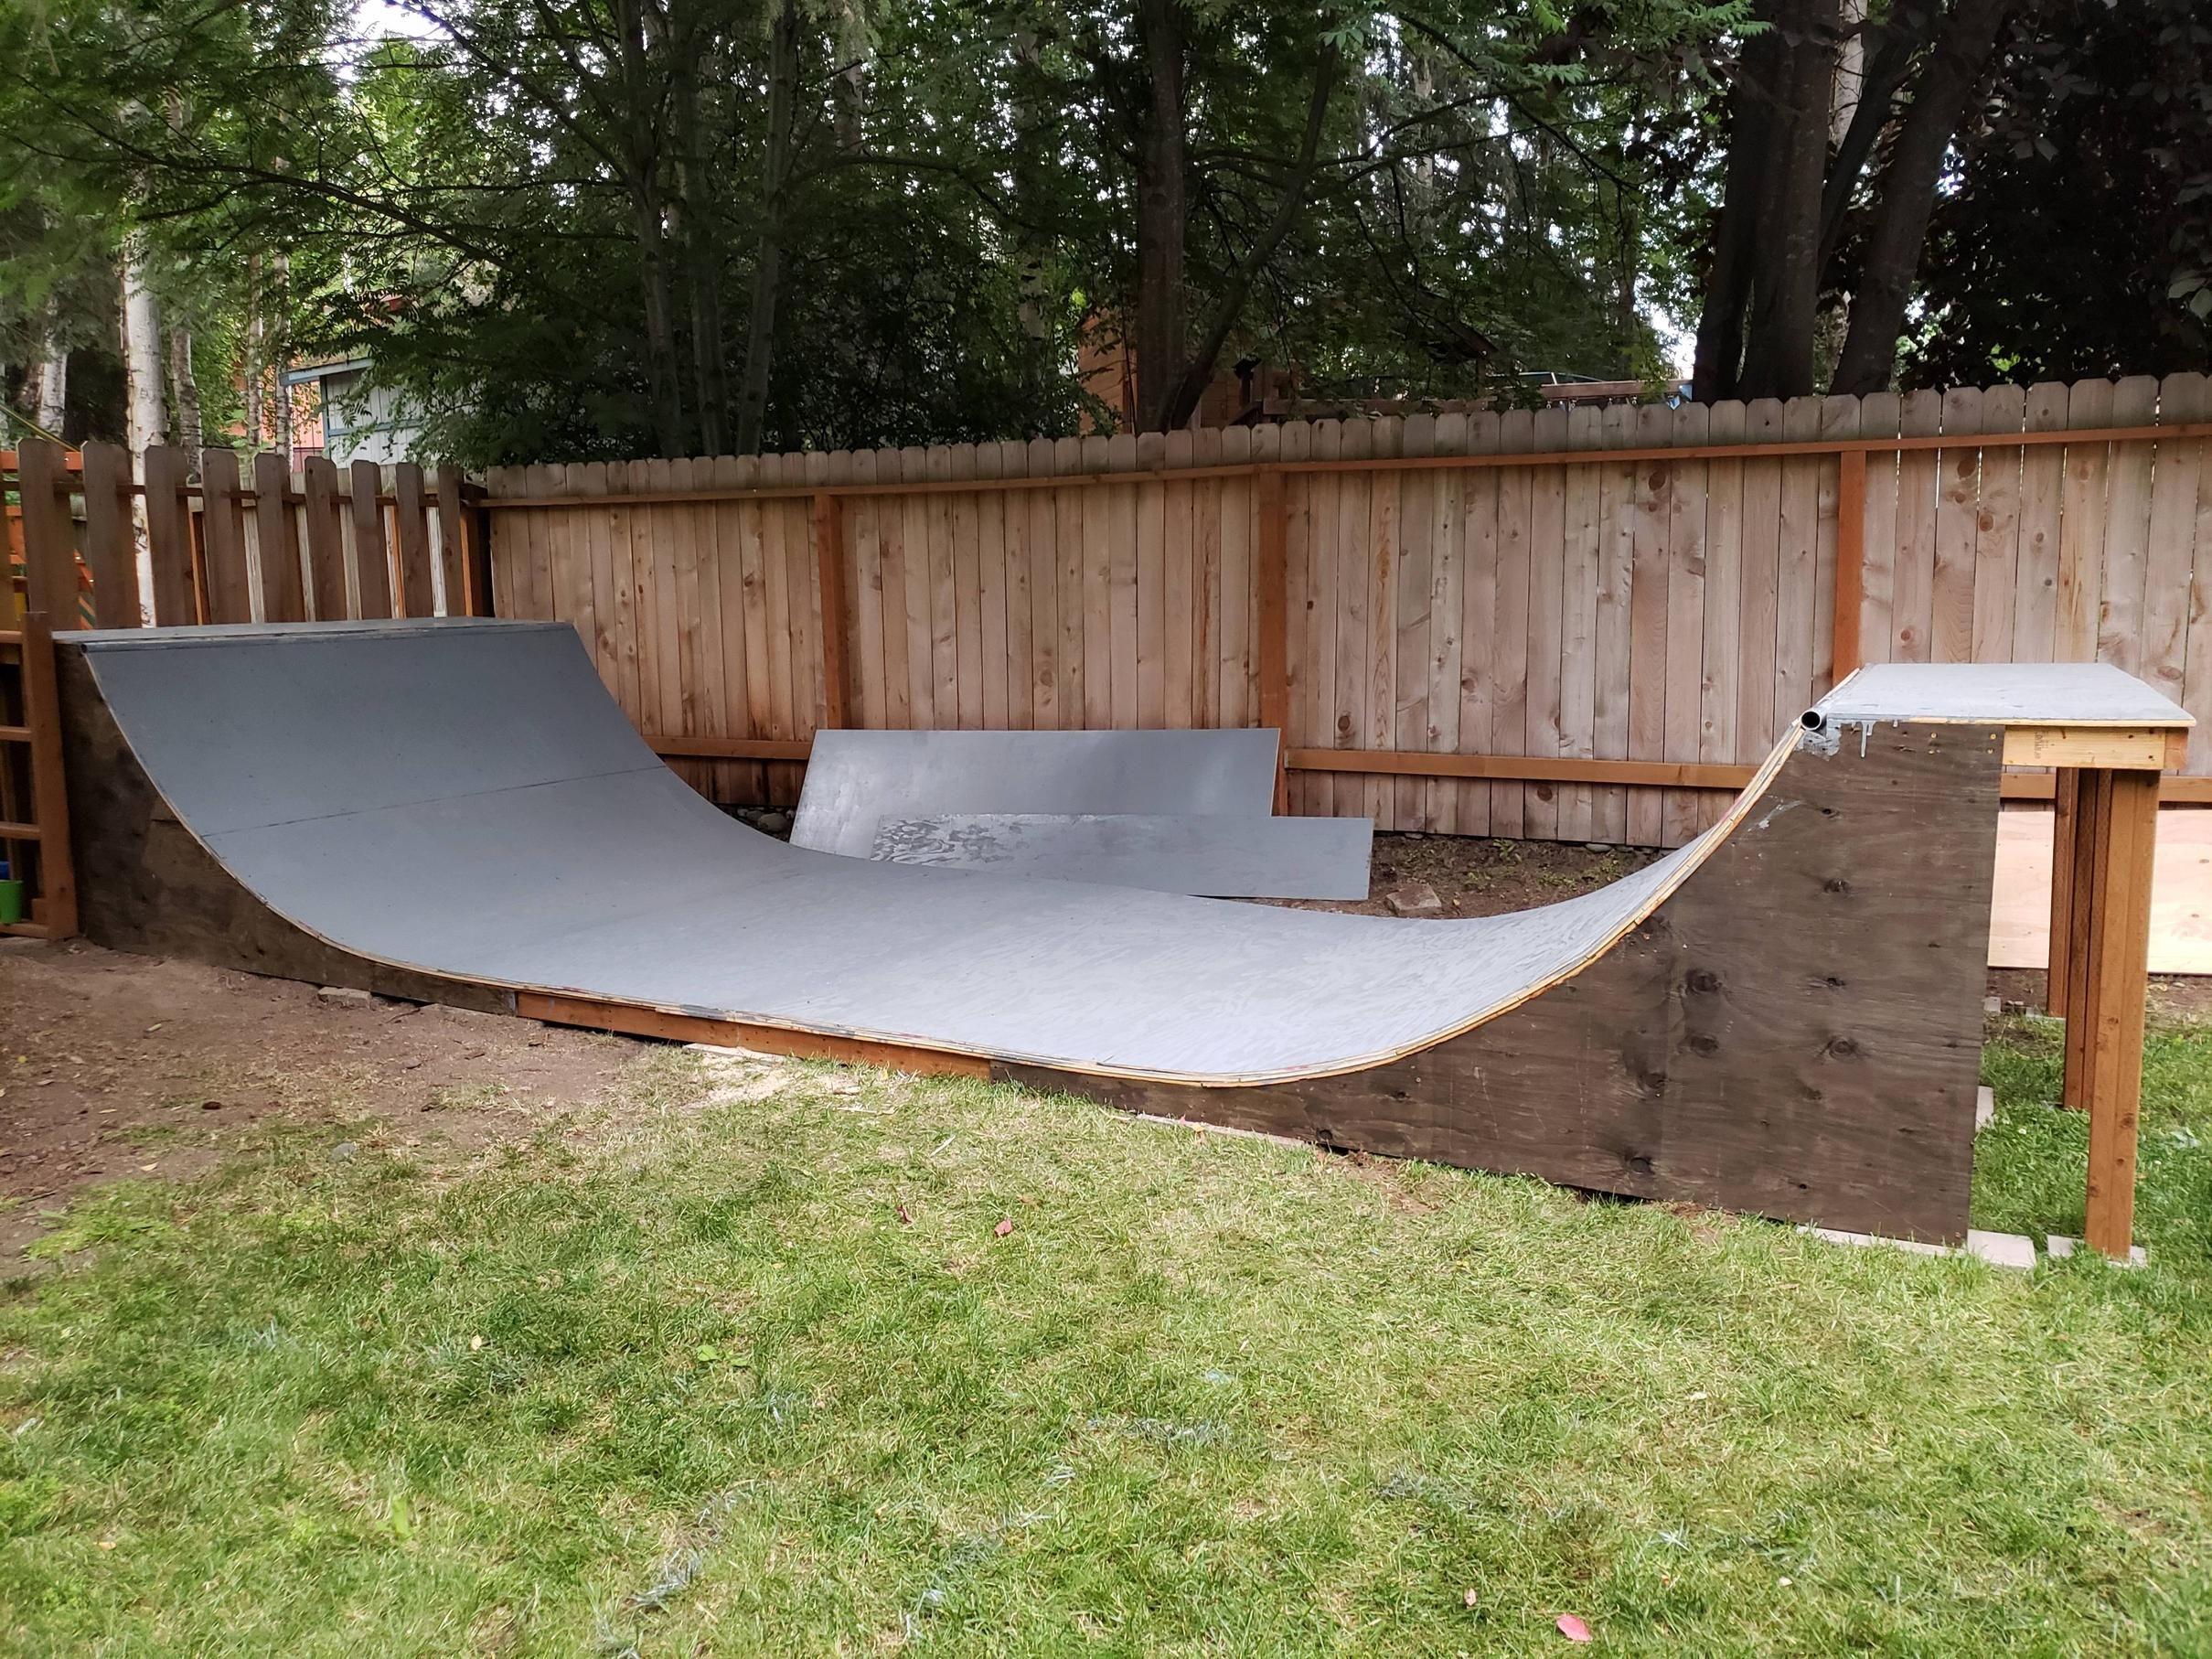 Skateboard Ramp For A Friends Kids And The Whole Neighborhood In 2021 Skateboard Ramps Backyard Skatepark Backyard Plan Backyard mini ramp plans